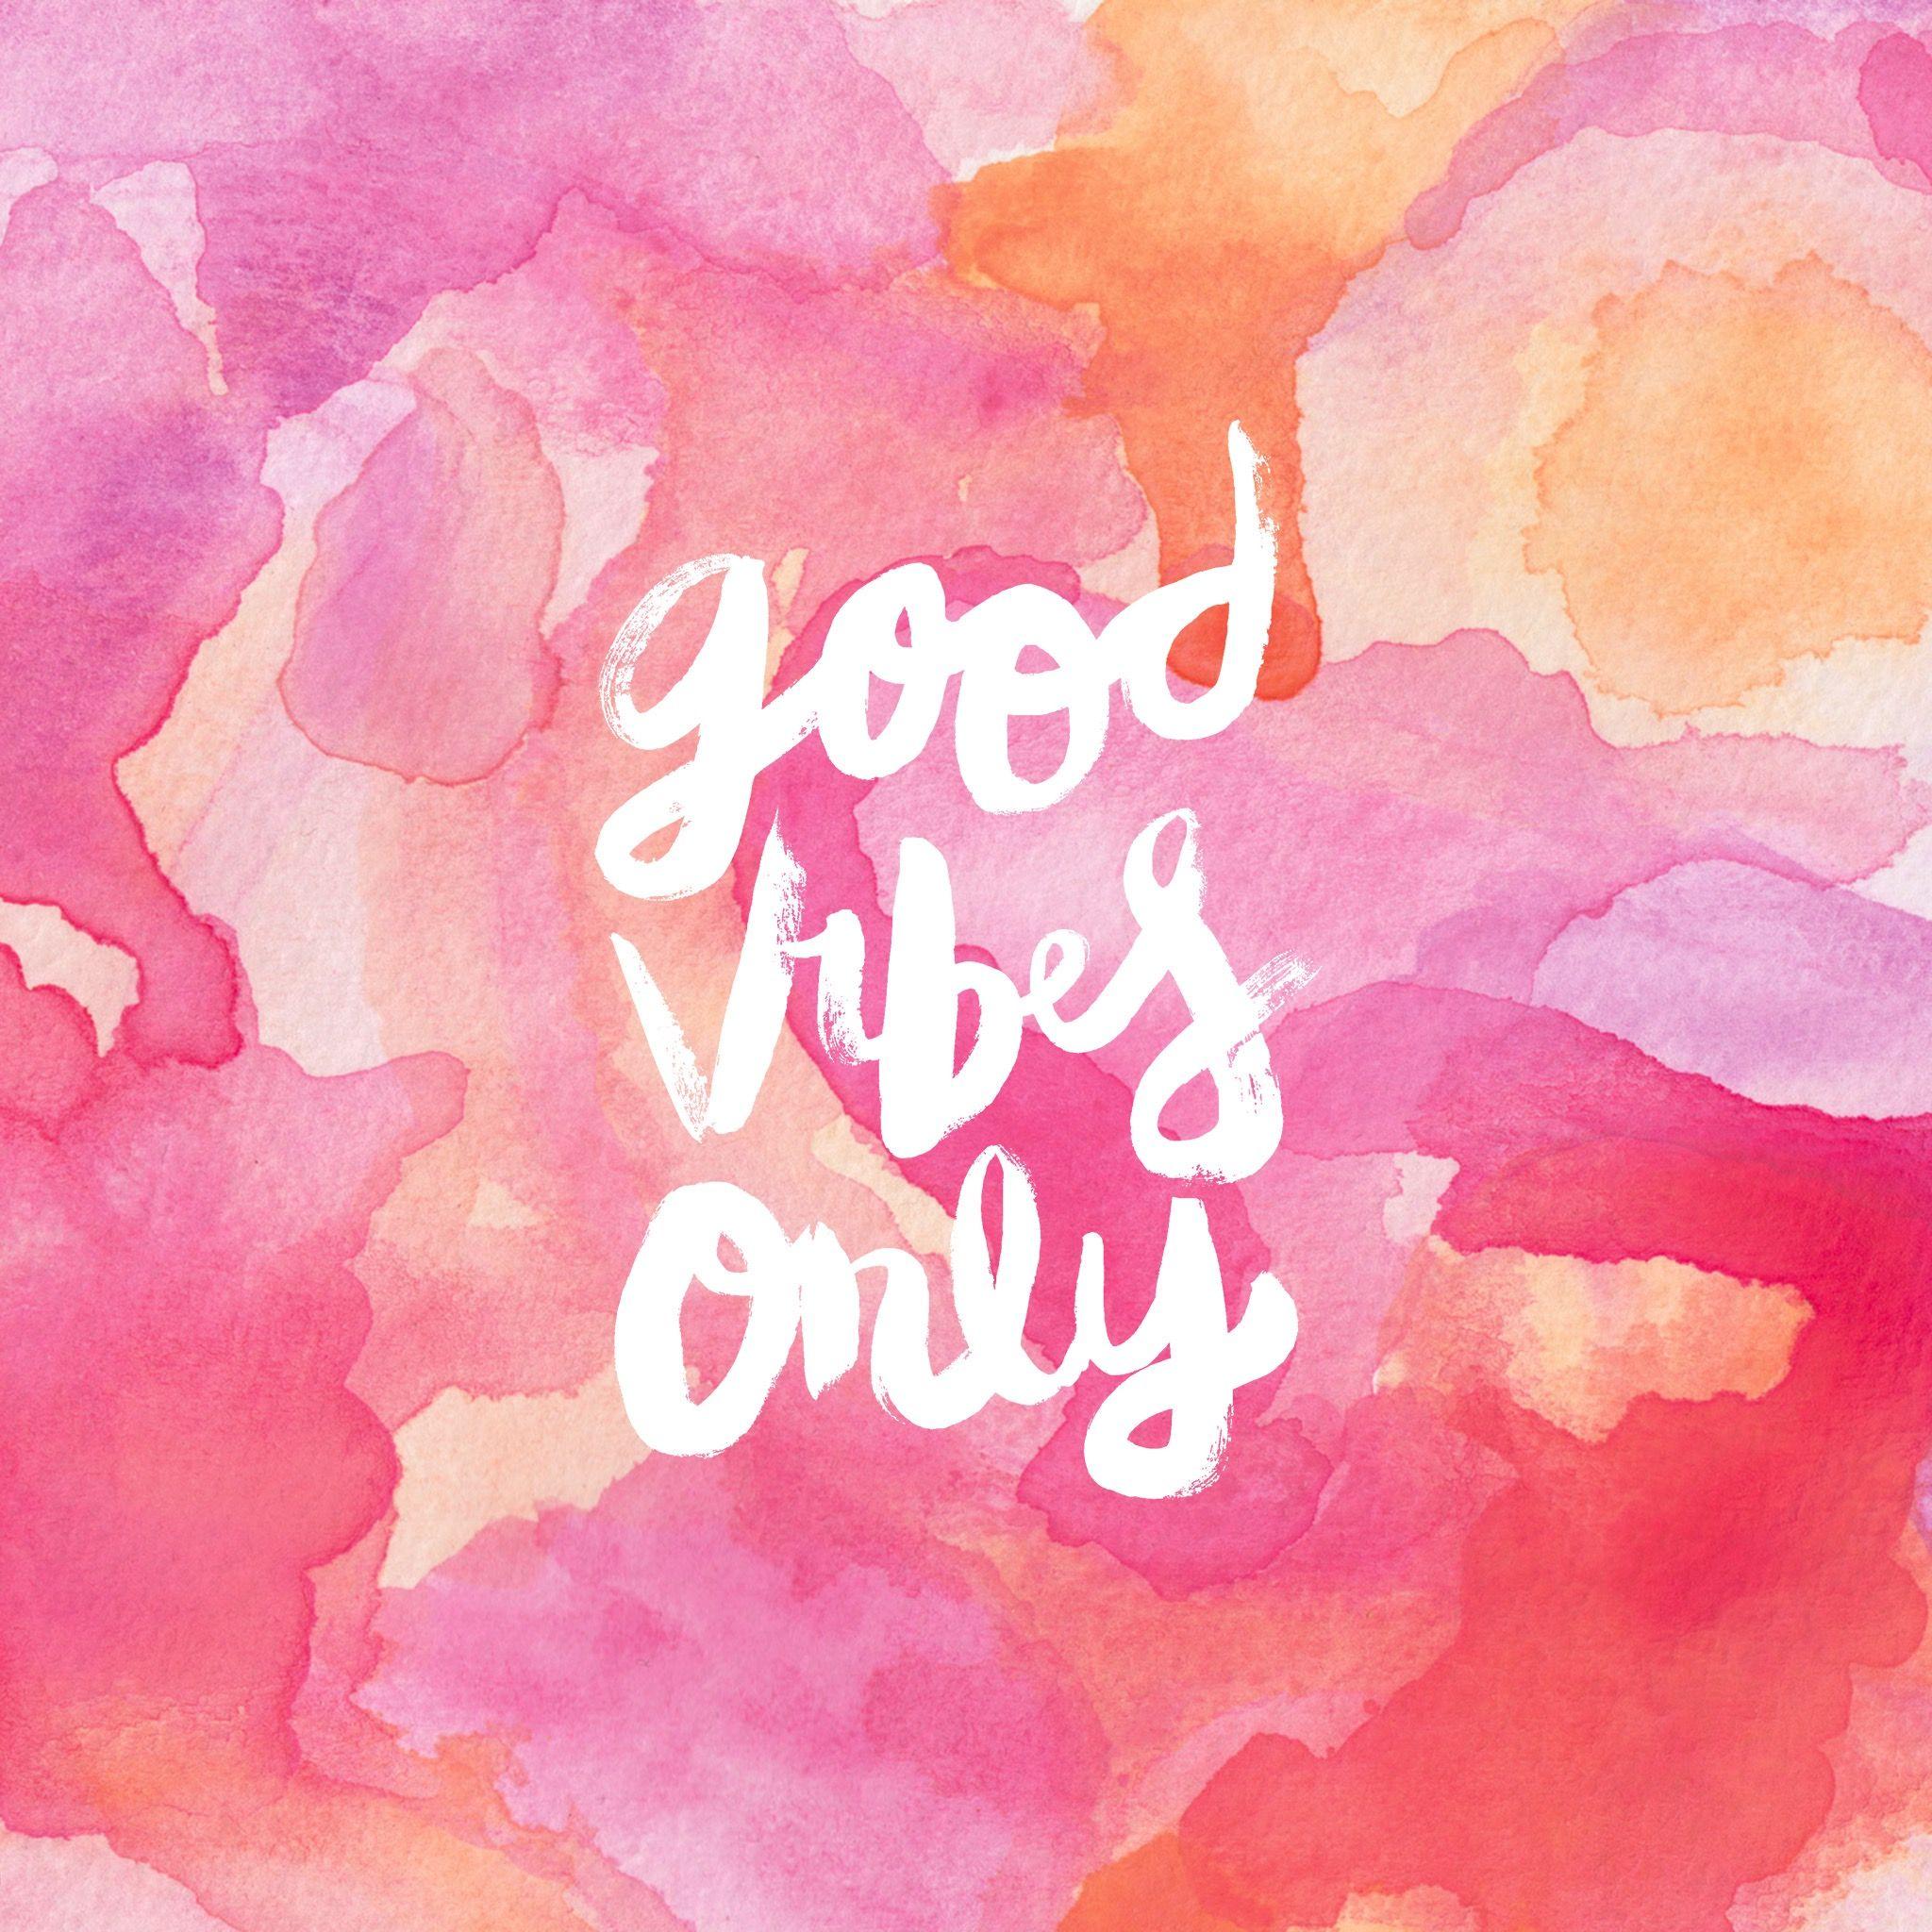 Cute Wallpaper Quotes: Cute Tumblr Wallpaper